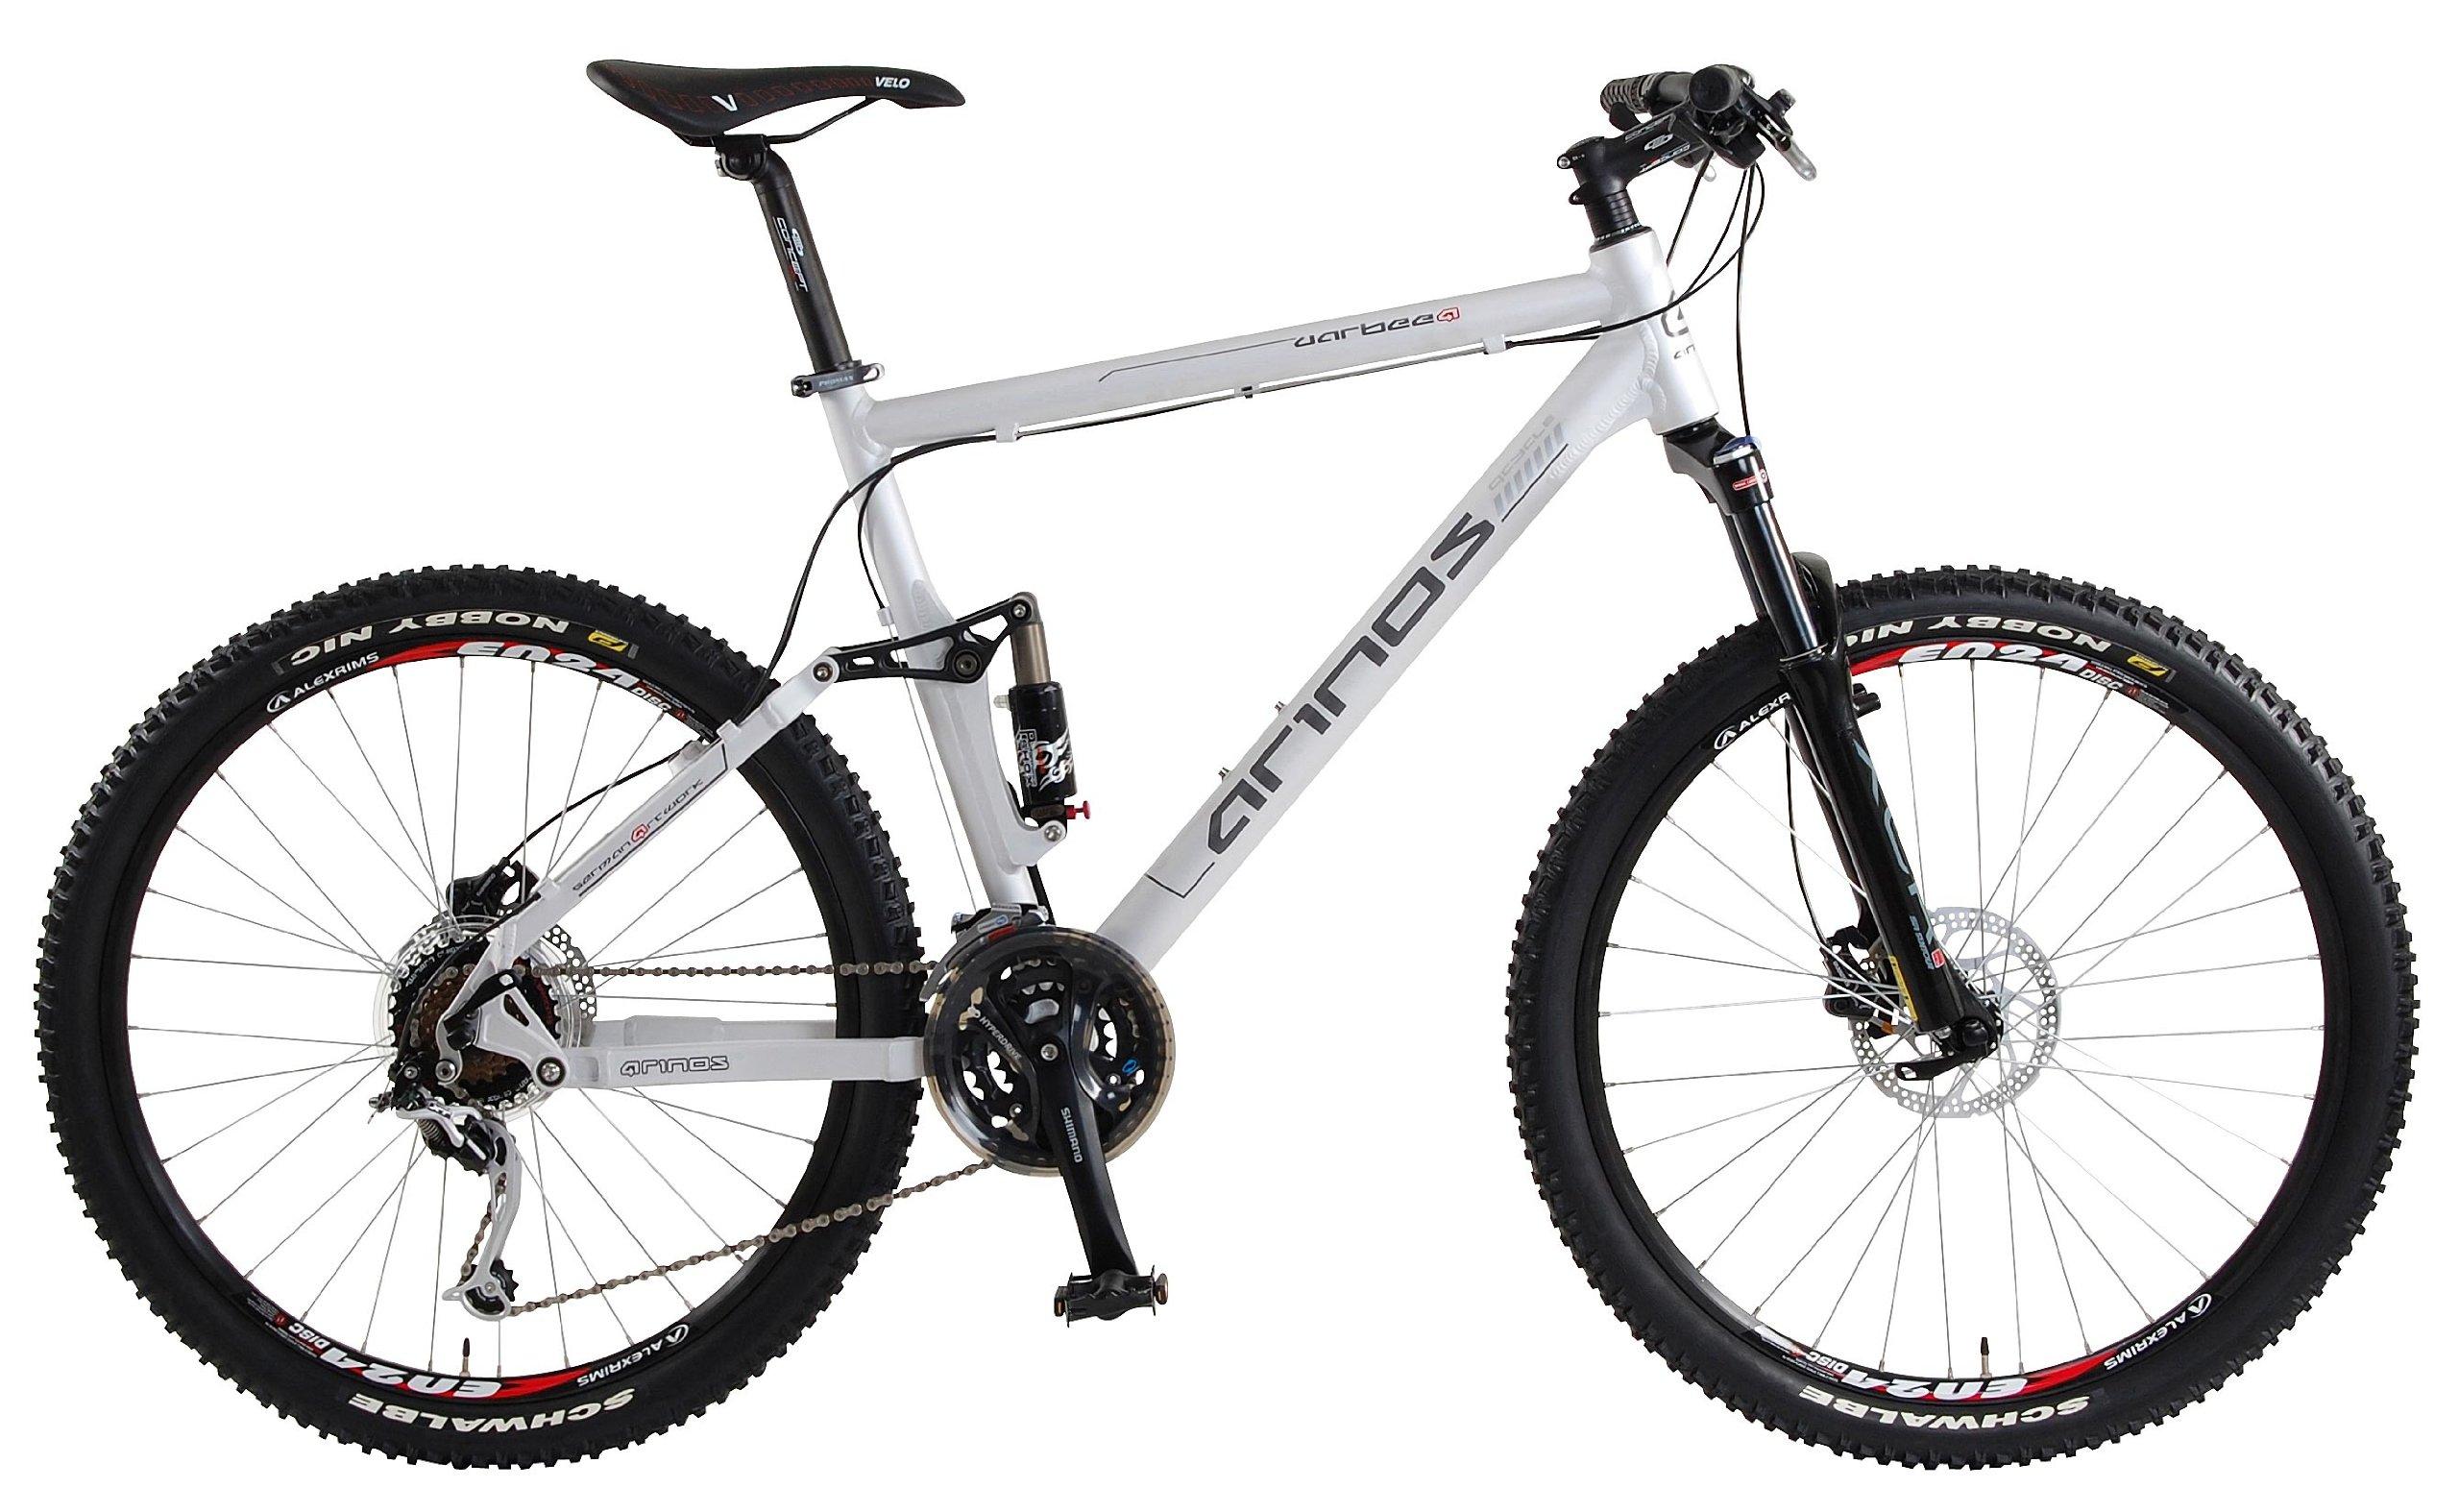 arinos 611140151 - Bicicleta Doble suspensión, Talla L (173-182 cm ...